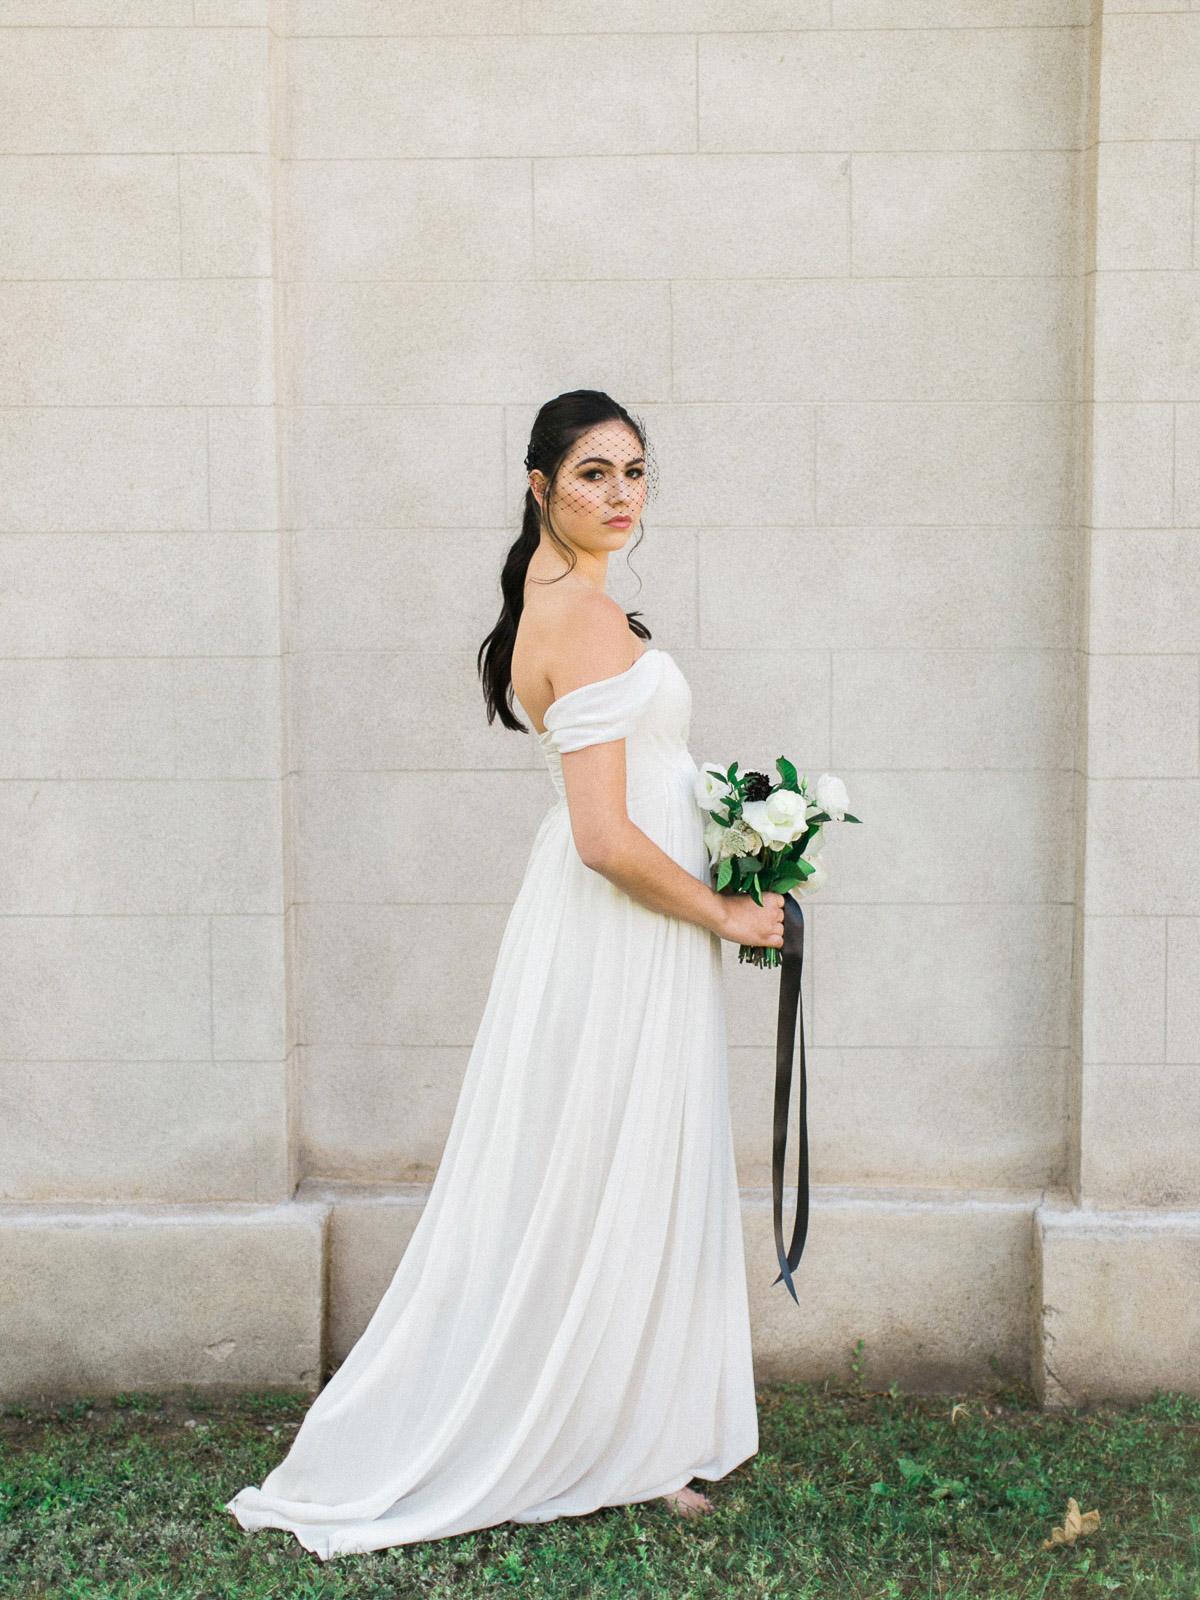 kurtz-orpia-photography-vineyard-bride-swish-list-dundurn-castle-dundas-wedding-editorial-24.jpg